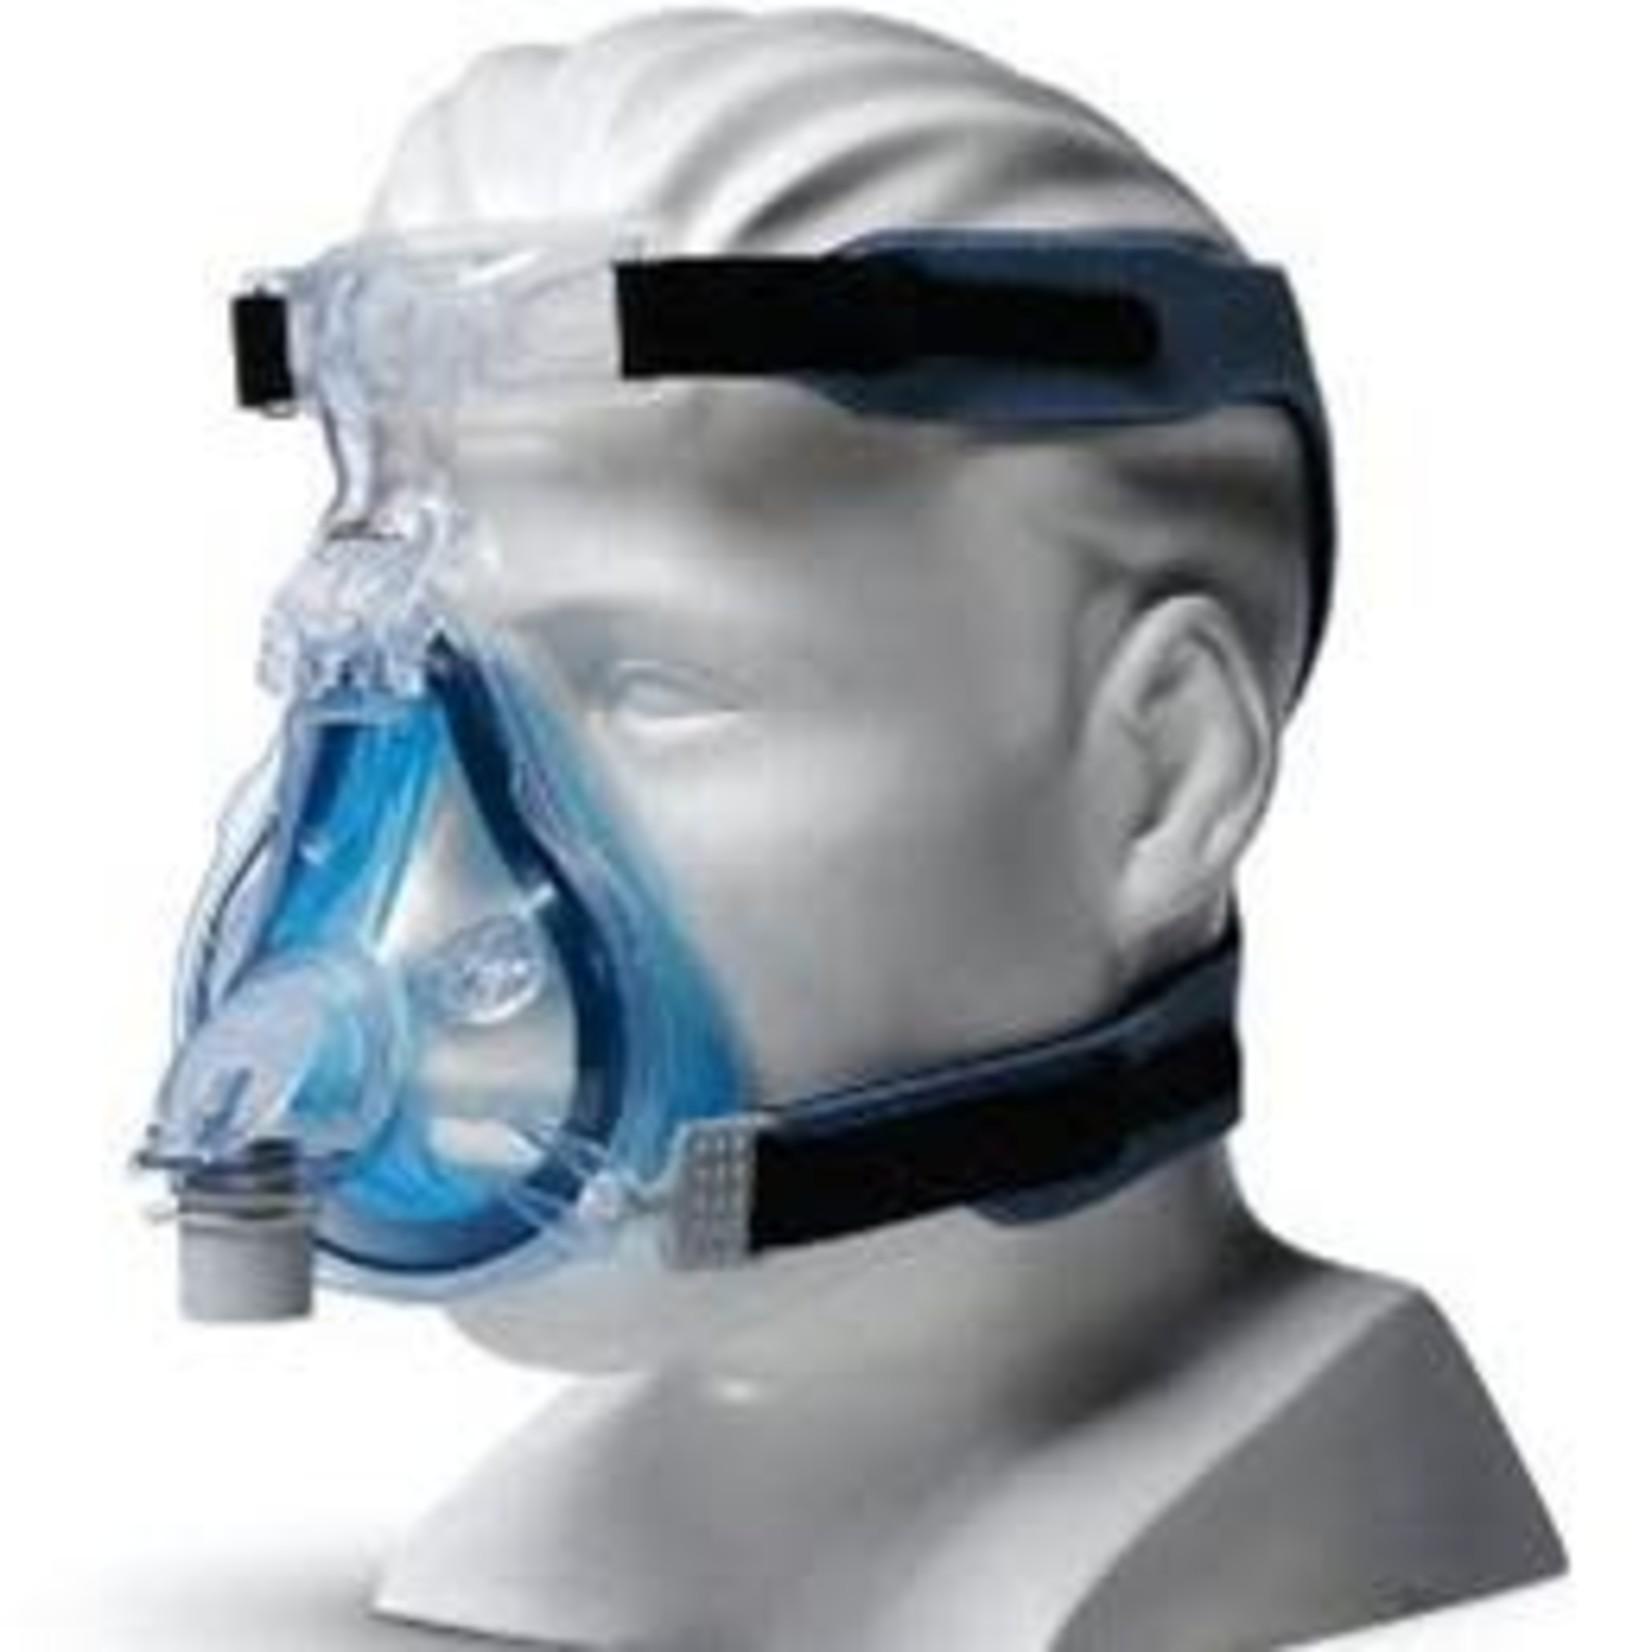 RESPIRONICS ComfortGel Full face CPAP Mask w/ Headgear Small